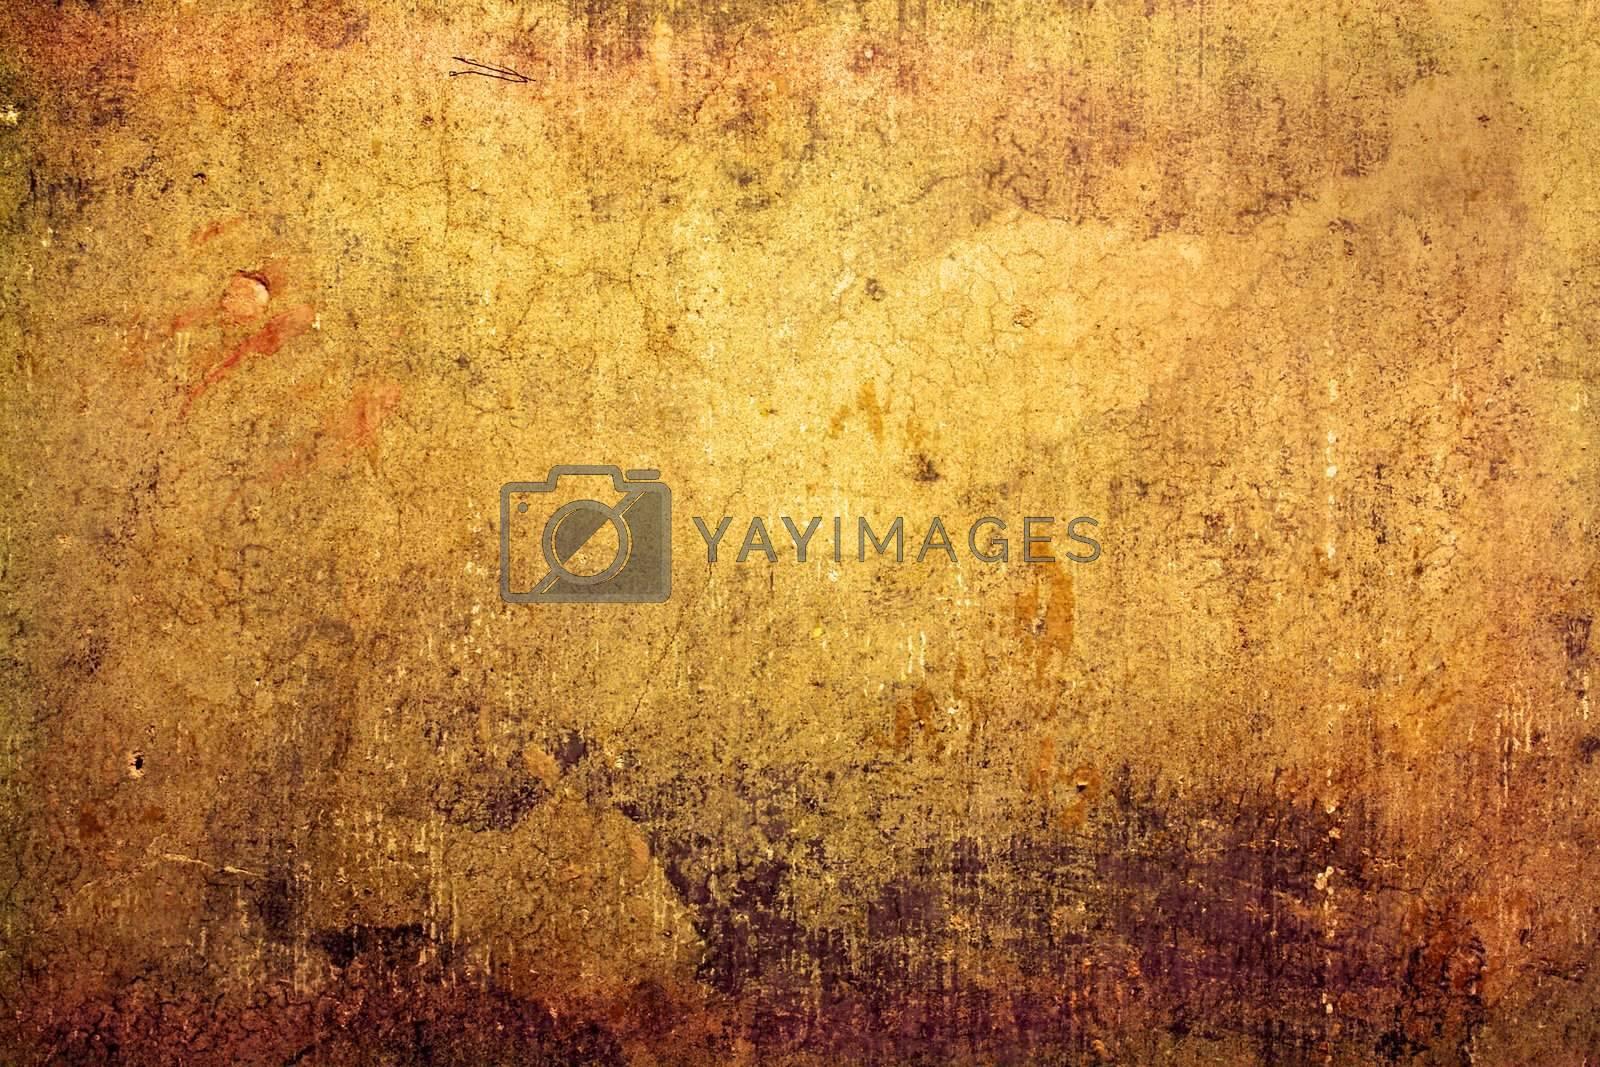 Royalty free image of grunge wall background 02 by massman